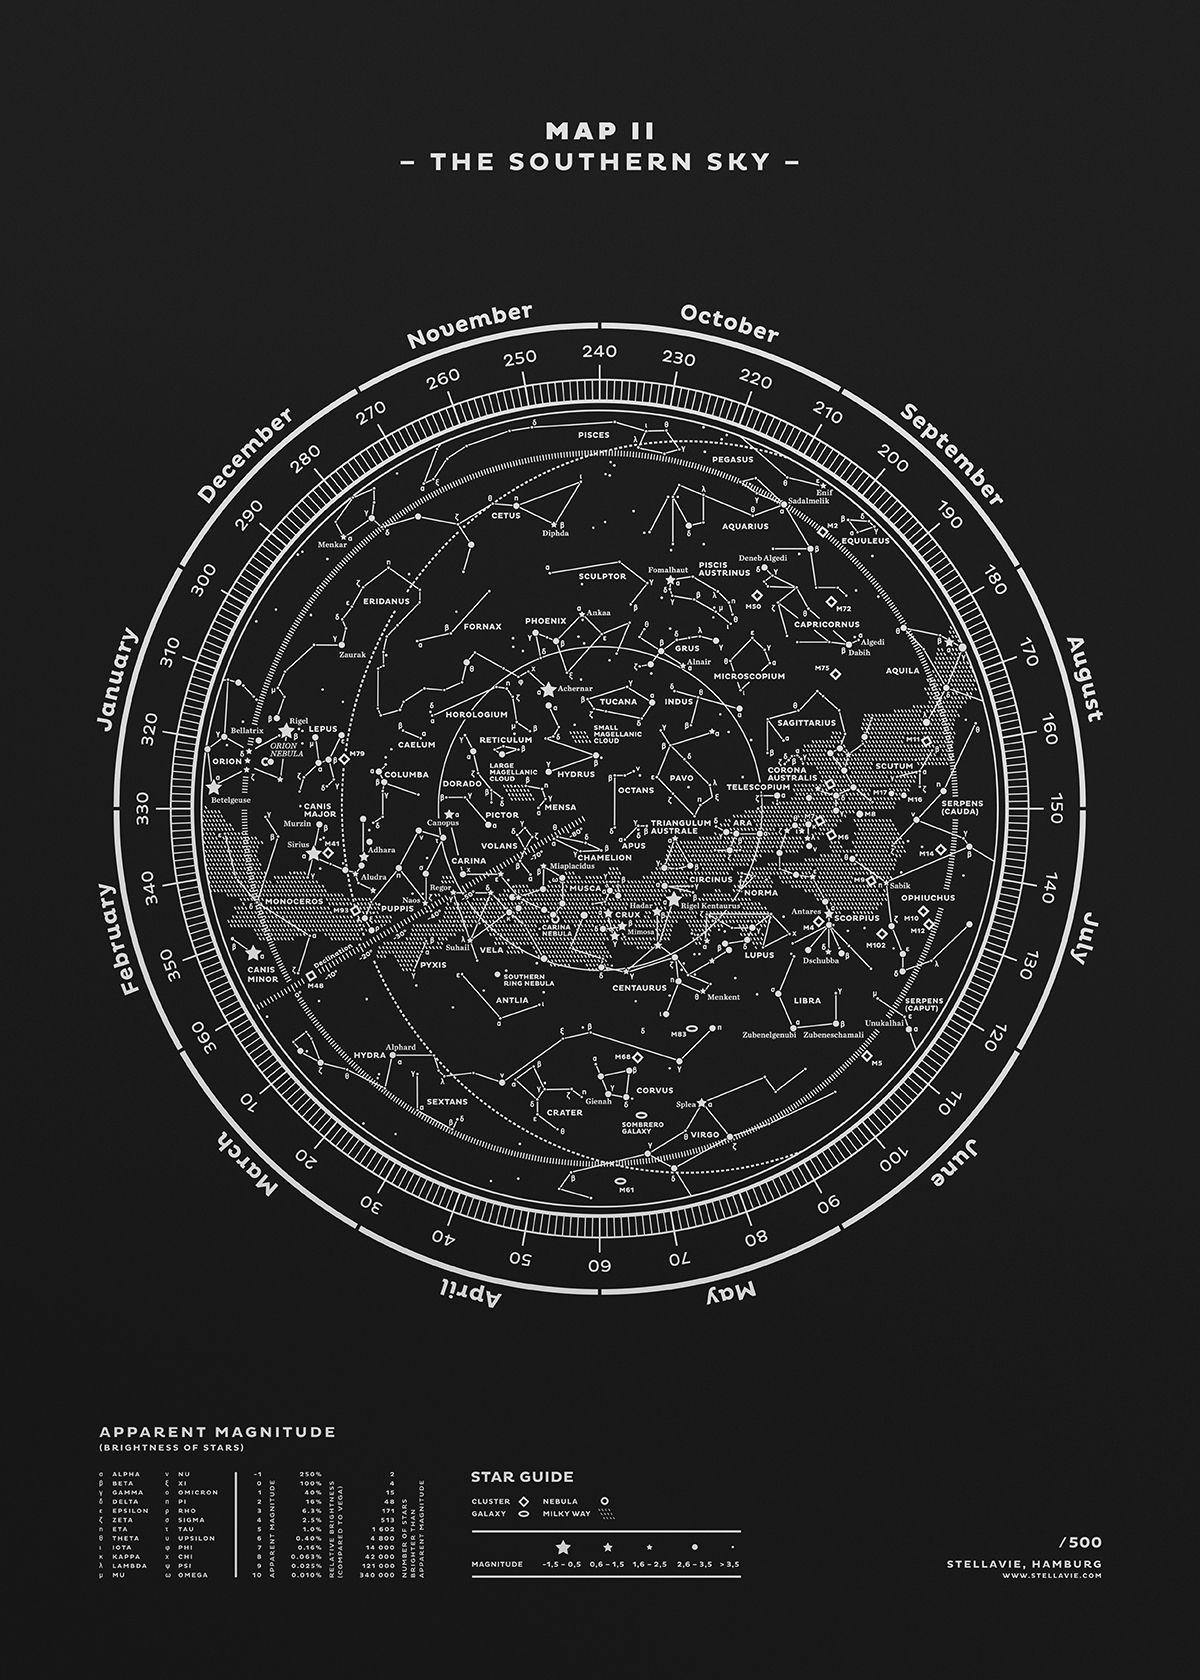 Map II The Southern Sky (Silver-White/Black) (please delete